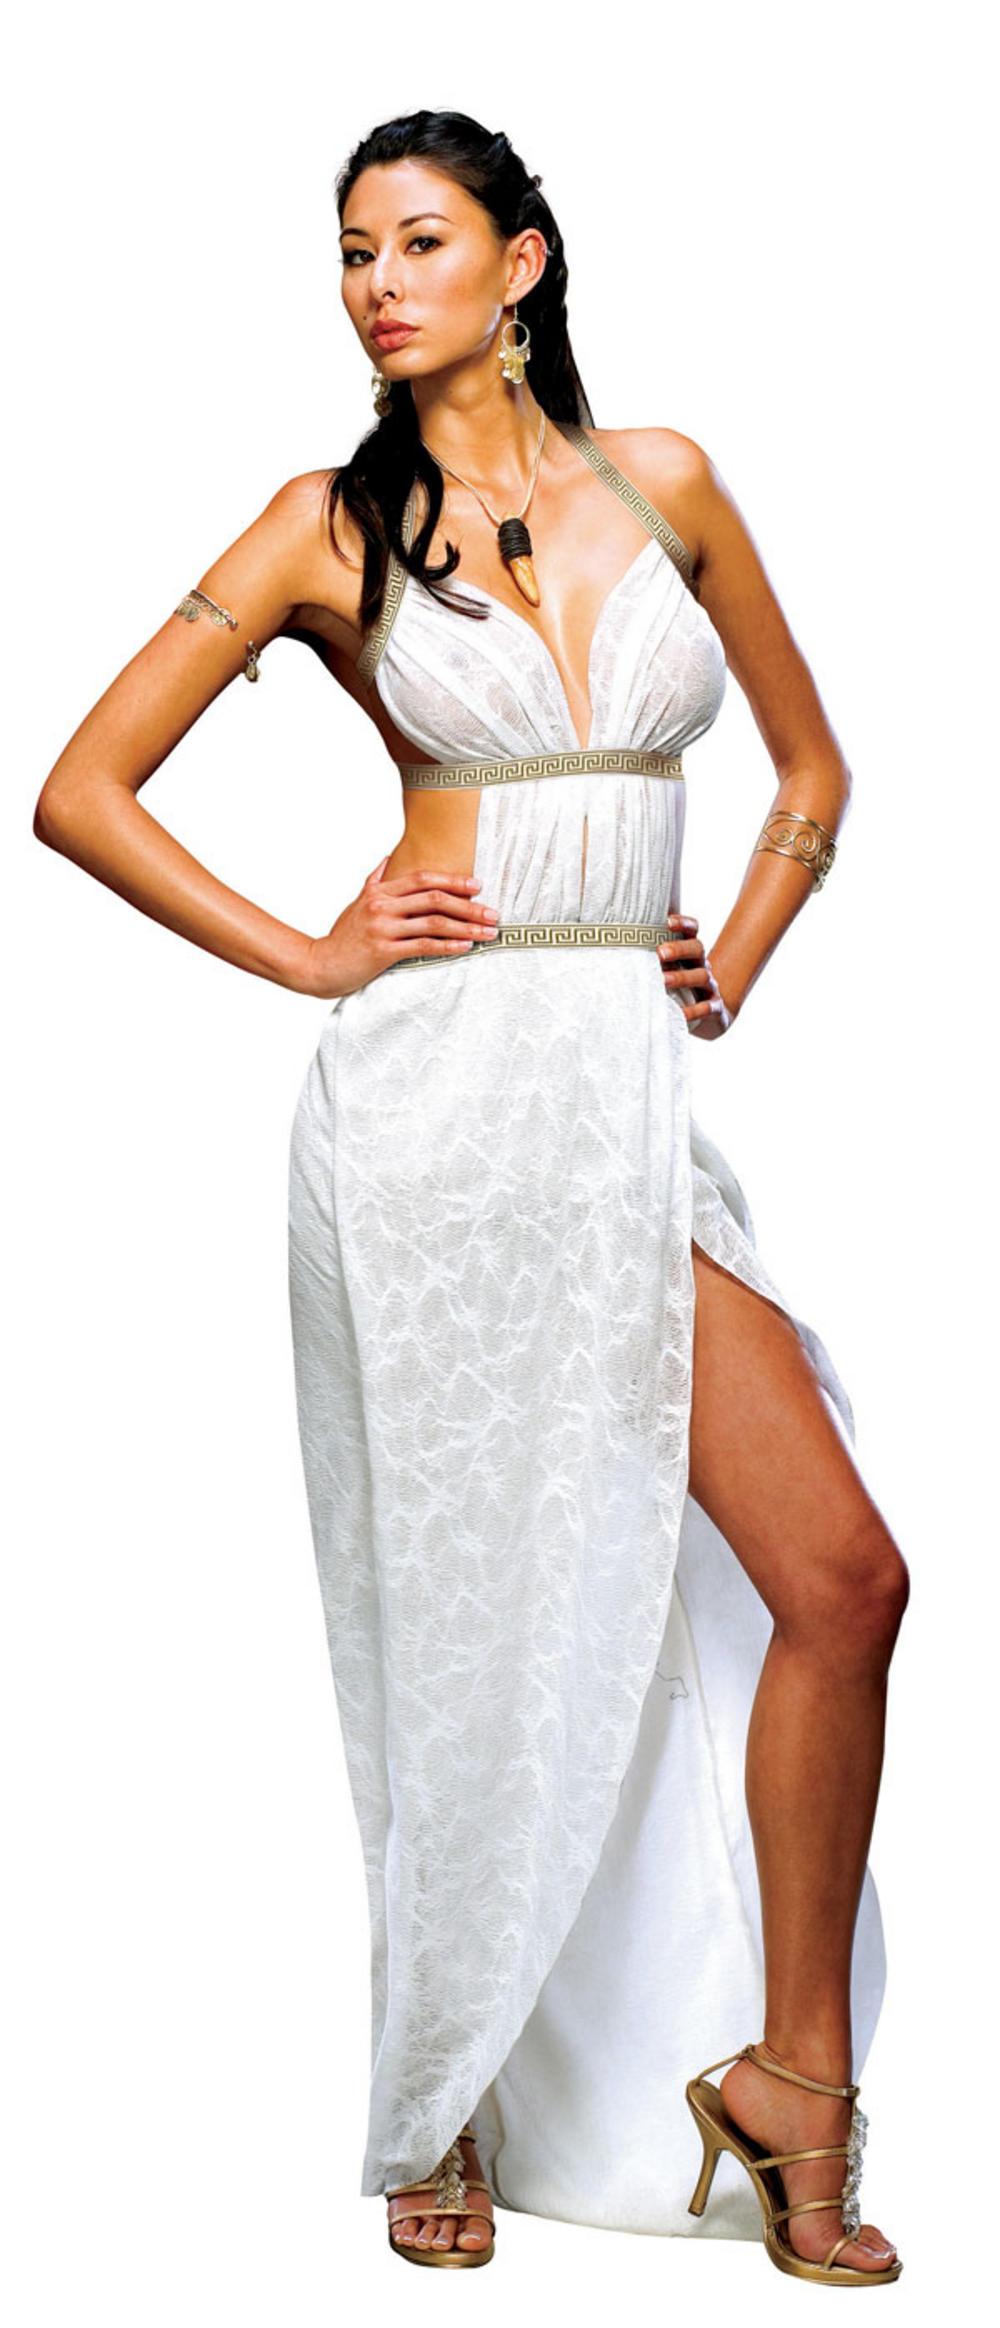 300 Queen Gorgo Spartan Costume  sc 1 st  Mega Fancy Dress & 300 Queen Gorgo Spartan Costume | All Ladies Costumes | Mega Fancy Dress